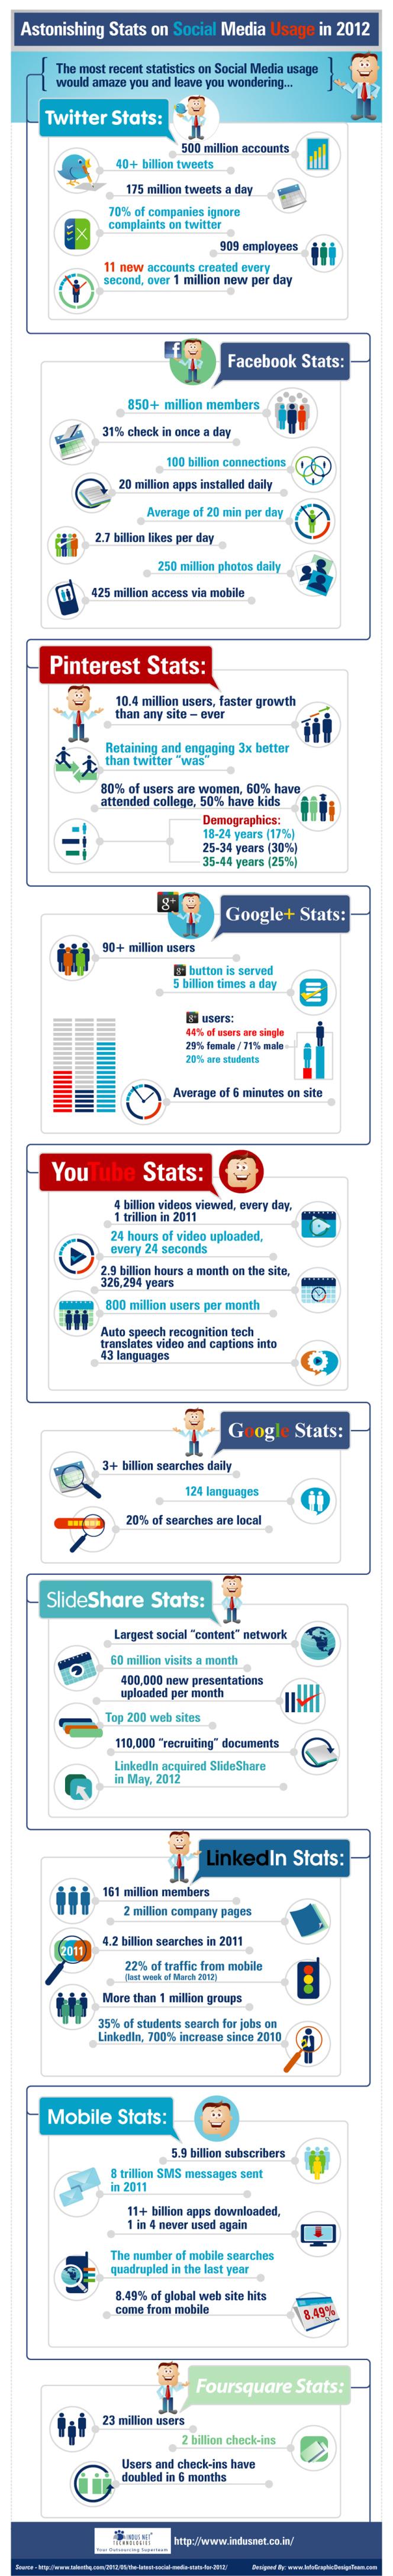 Astonishing Stats on #SocialMedia Usage in 2012 [#Infographic]